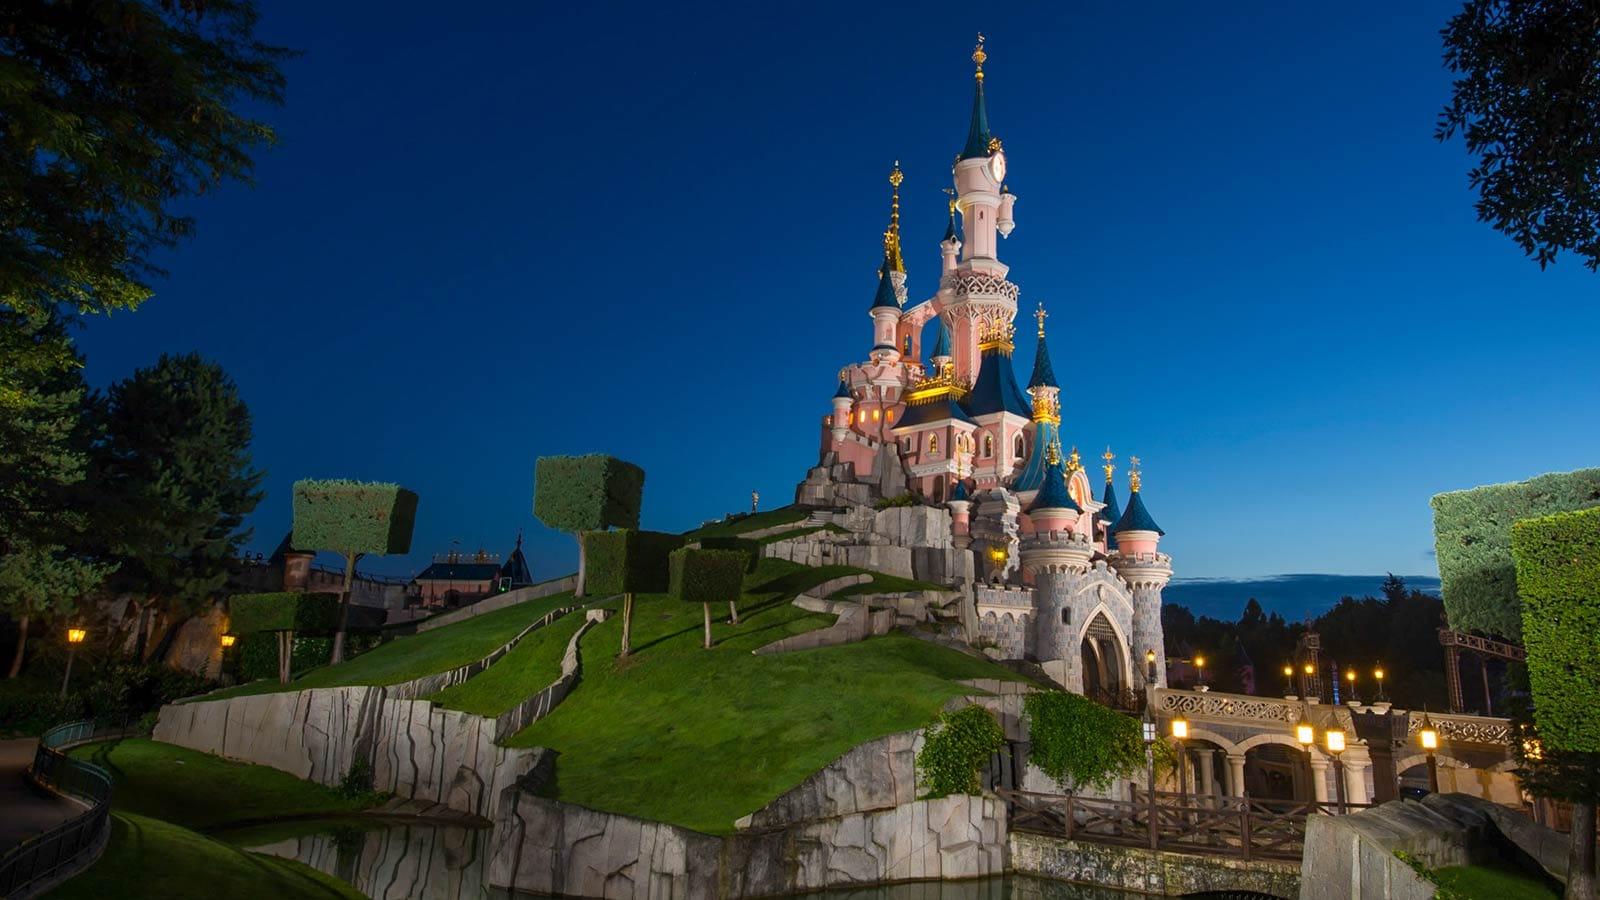 The exterior of Sleeping Beauty Castle in Disneyland Paris